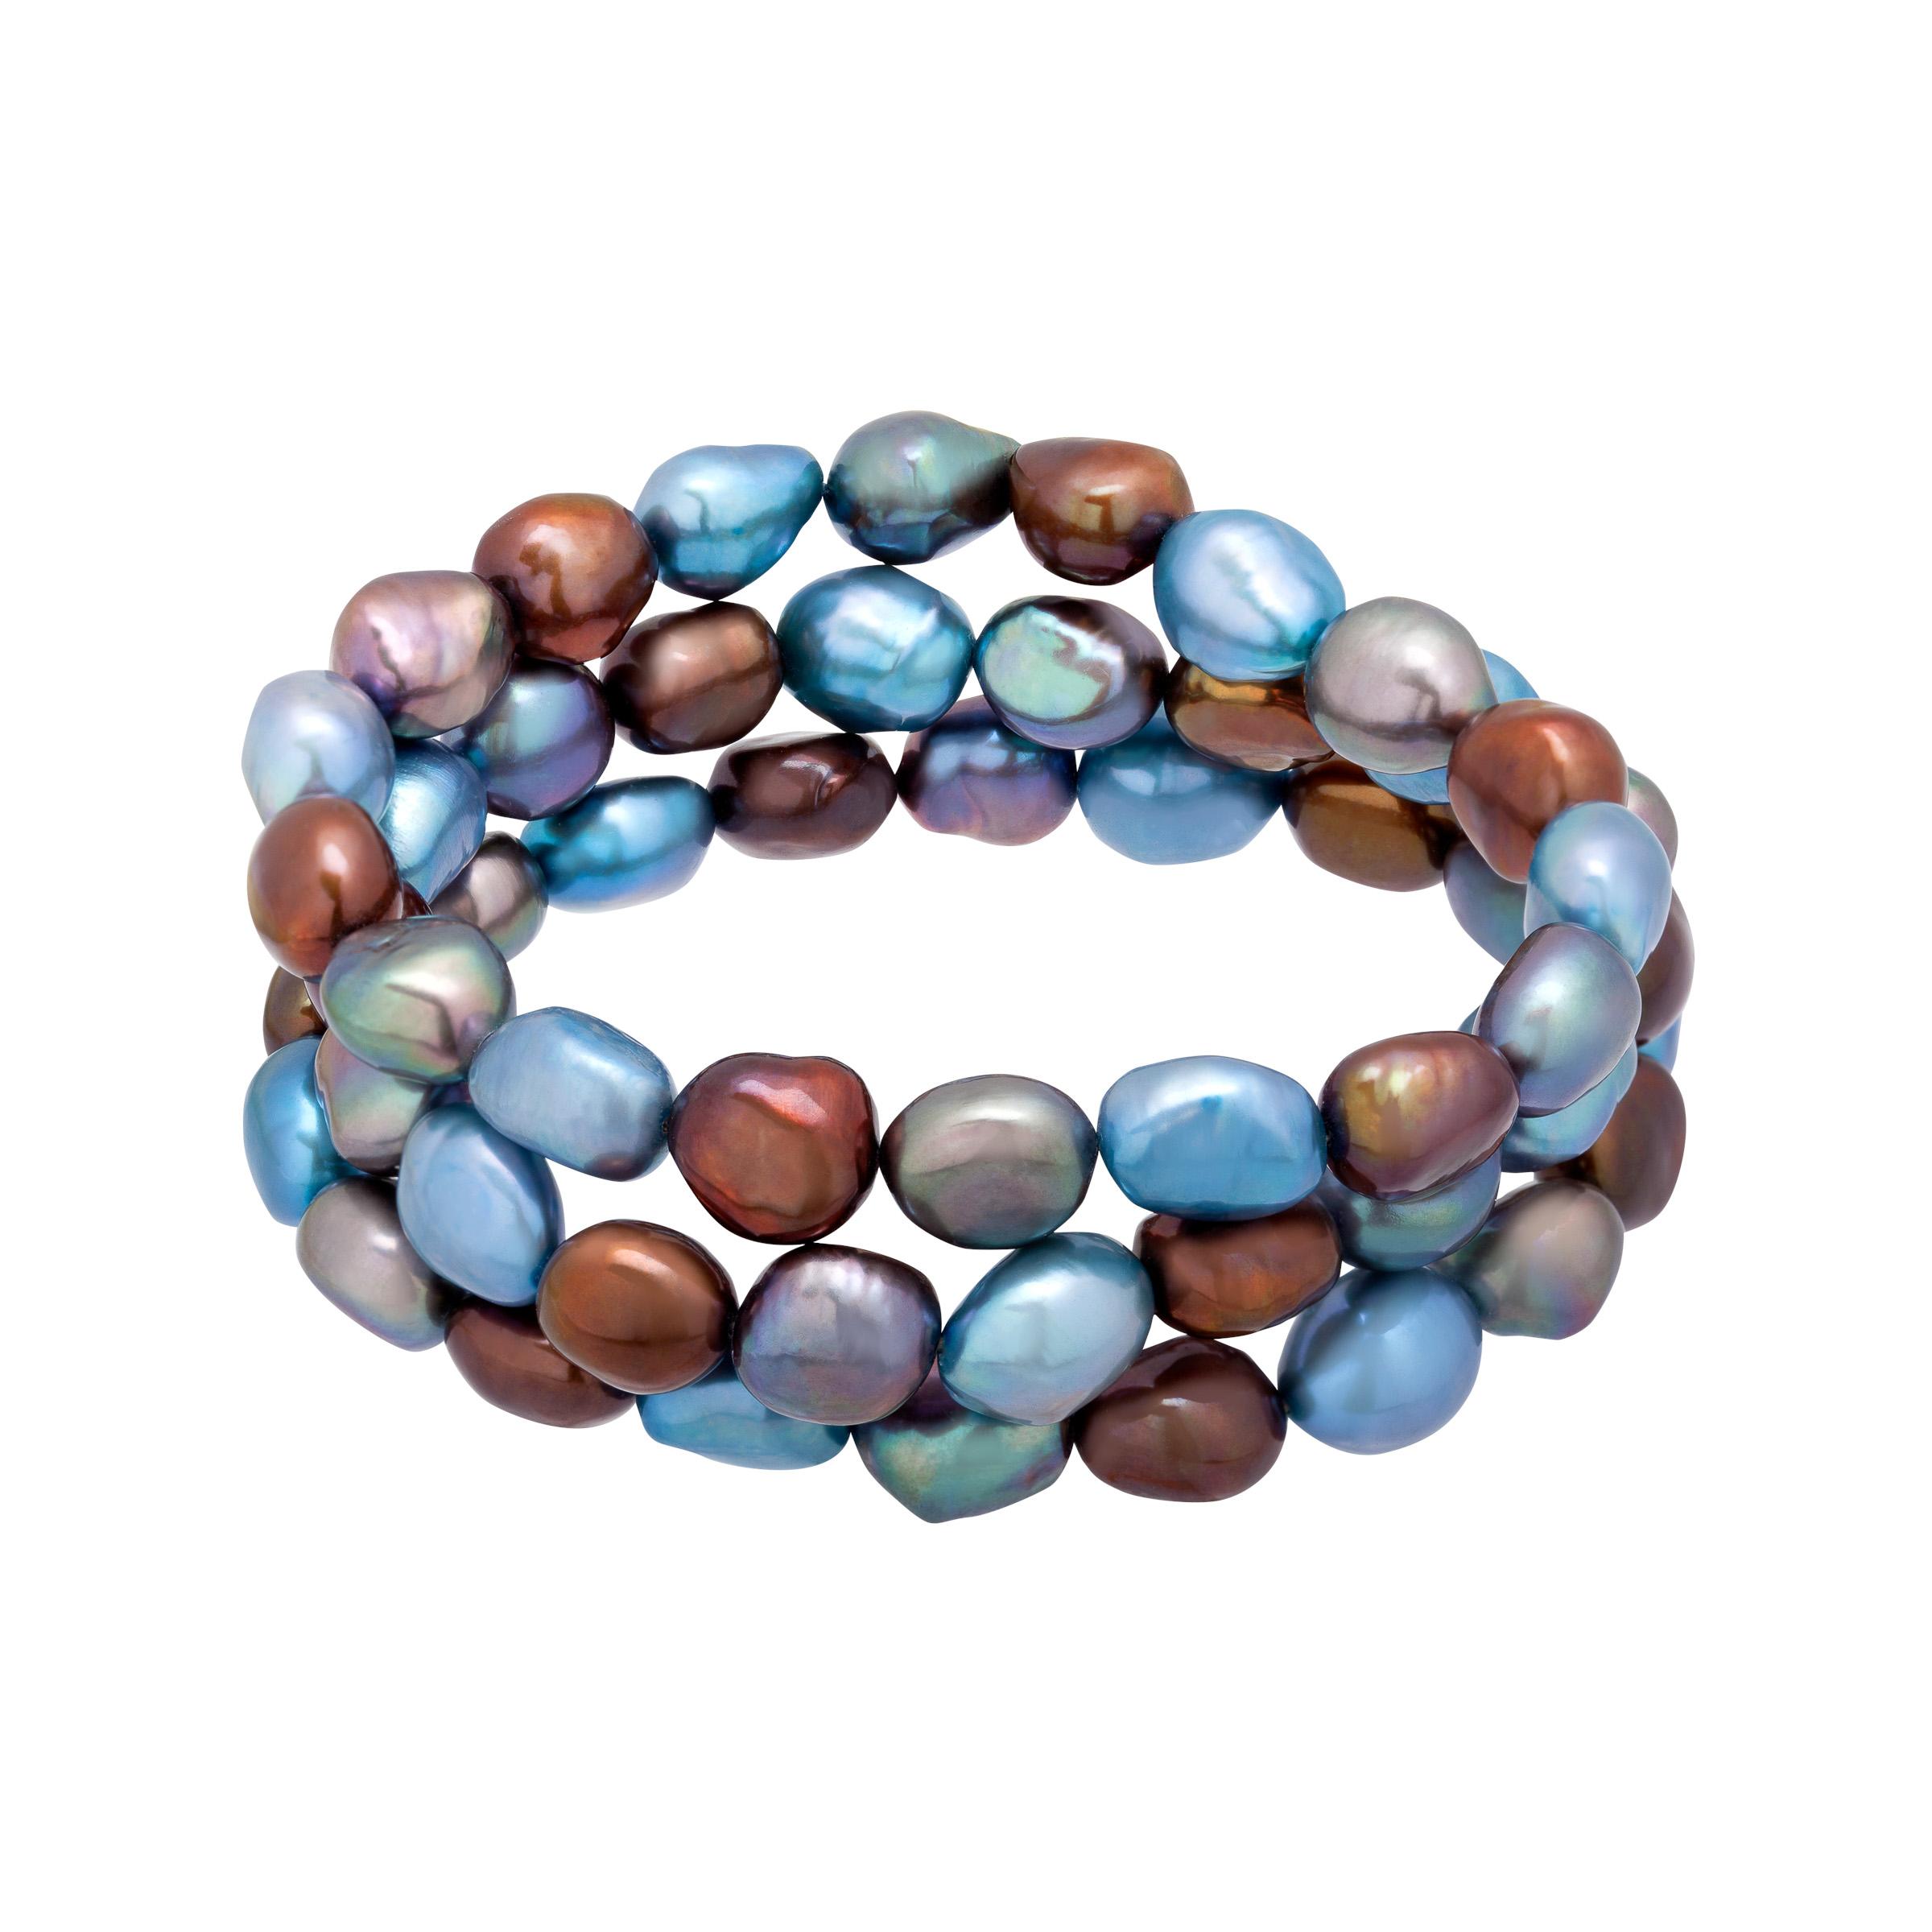 Honora Set of 3 9-10 mm Denim Baroque Freshwater Cultured Pearl Bead Bracelets